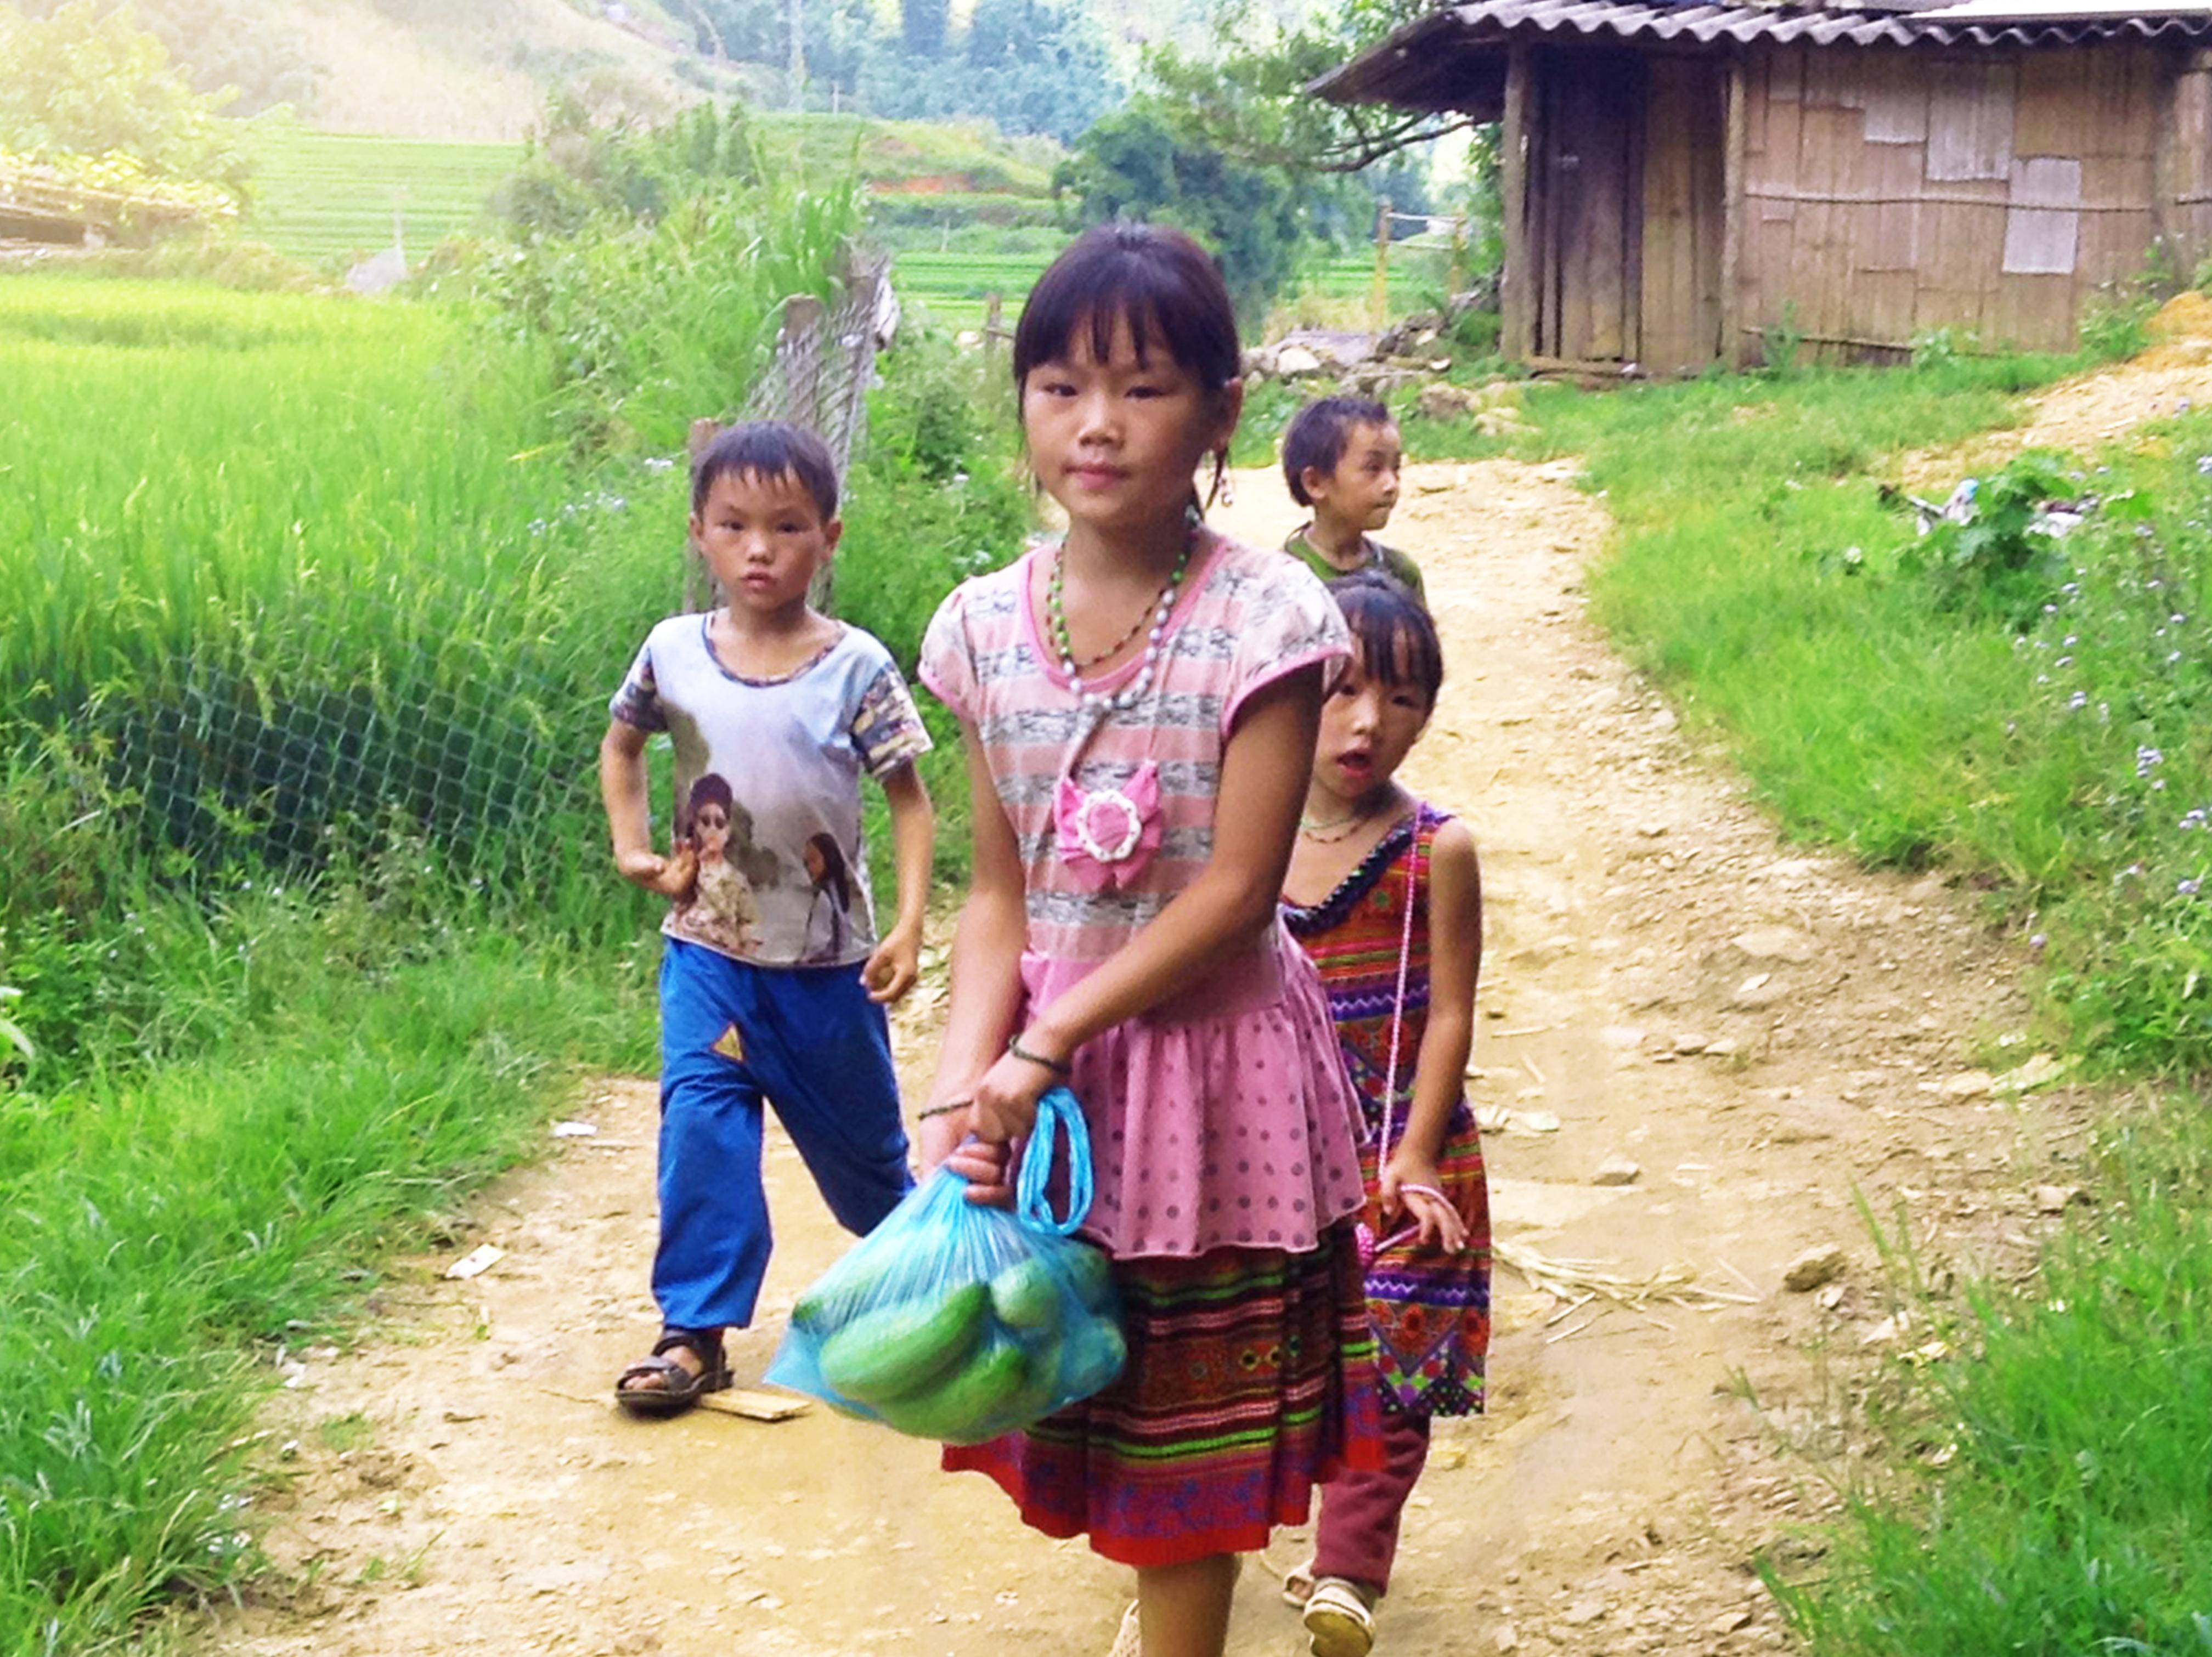 asia, vietnam, sapa, children, kids, азия, вьетнам, сапа, дети